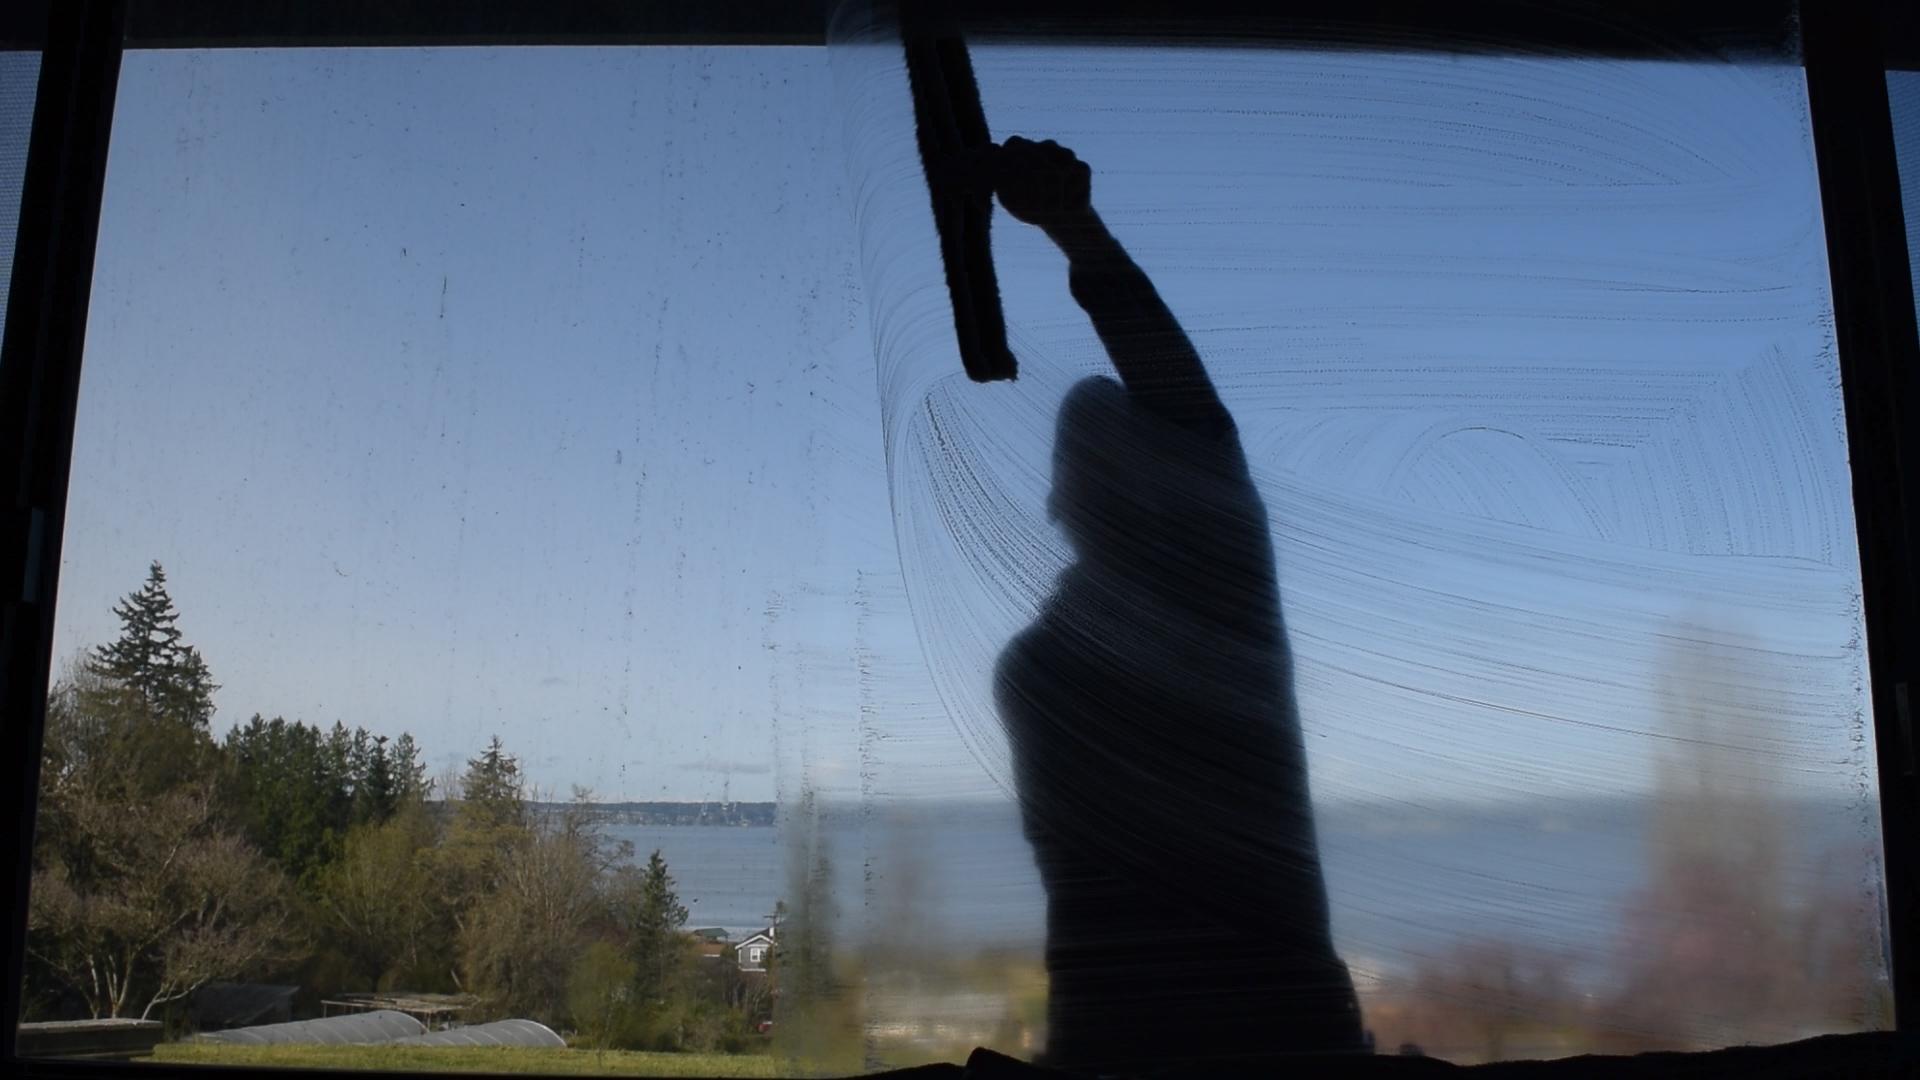 clean-dirty-window-comparison-2.jpg